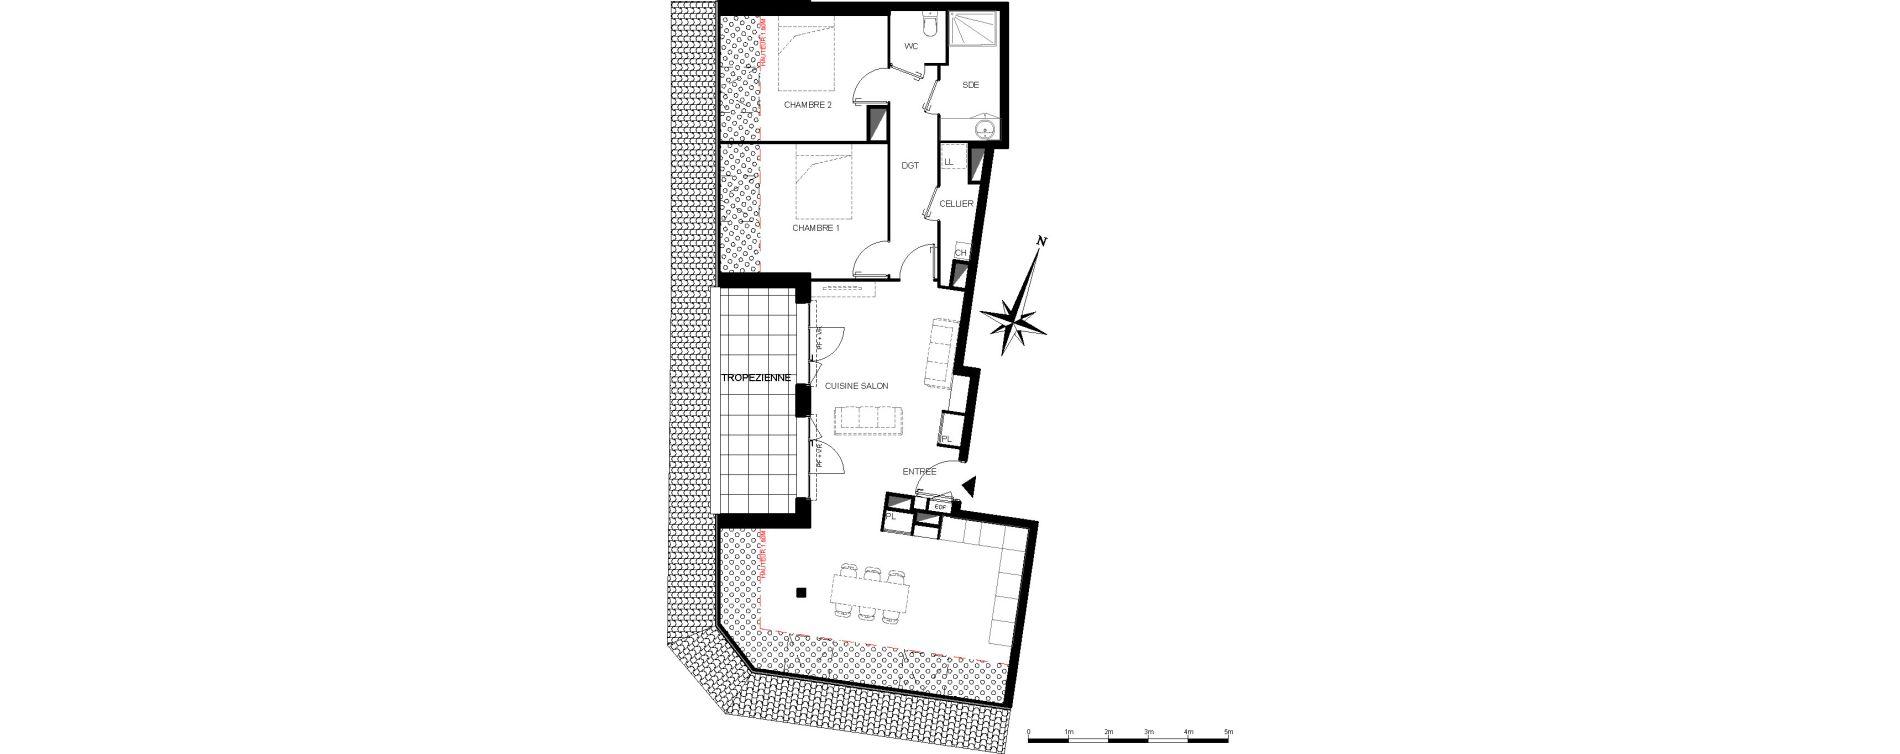 Appartement T3 de 78,00 m2 à Bègles La ferrade